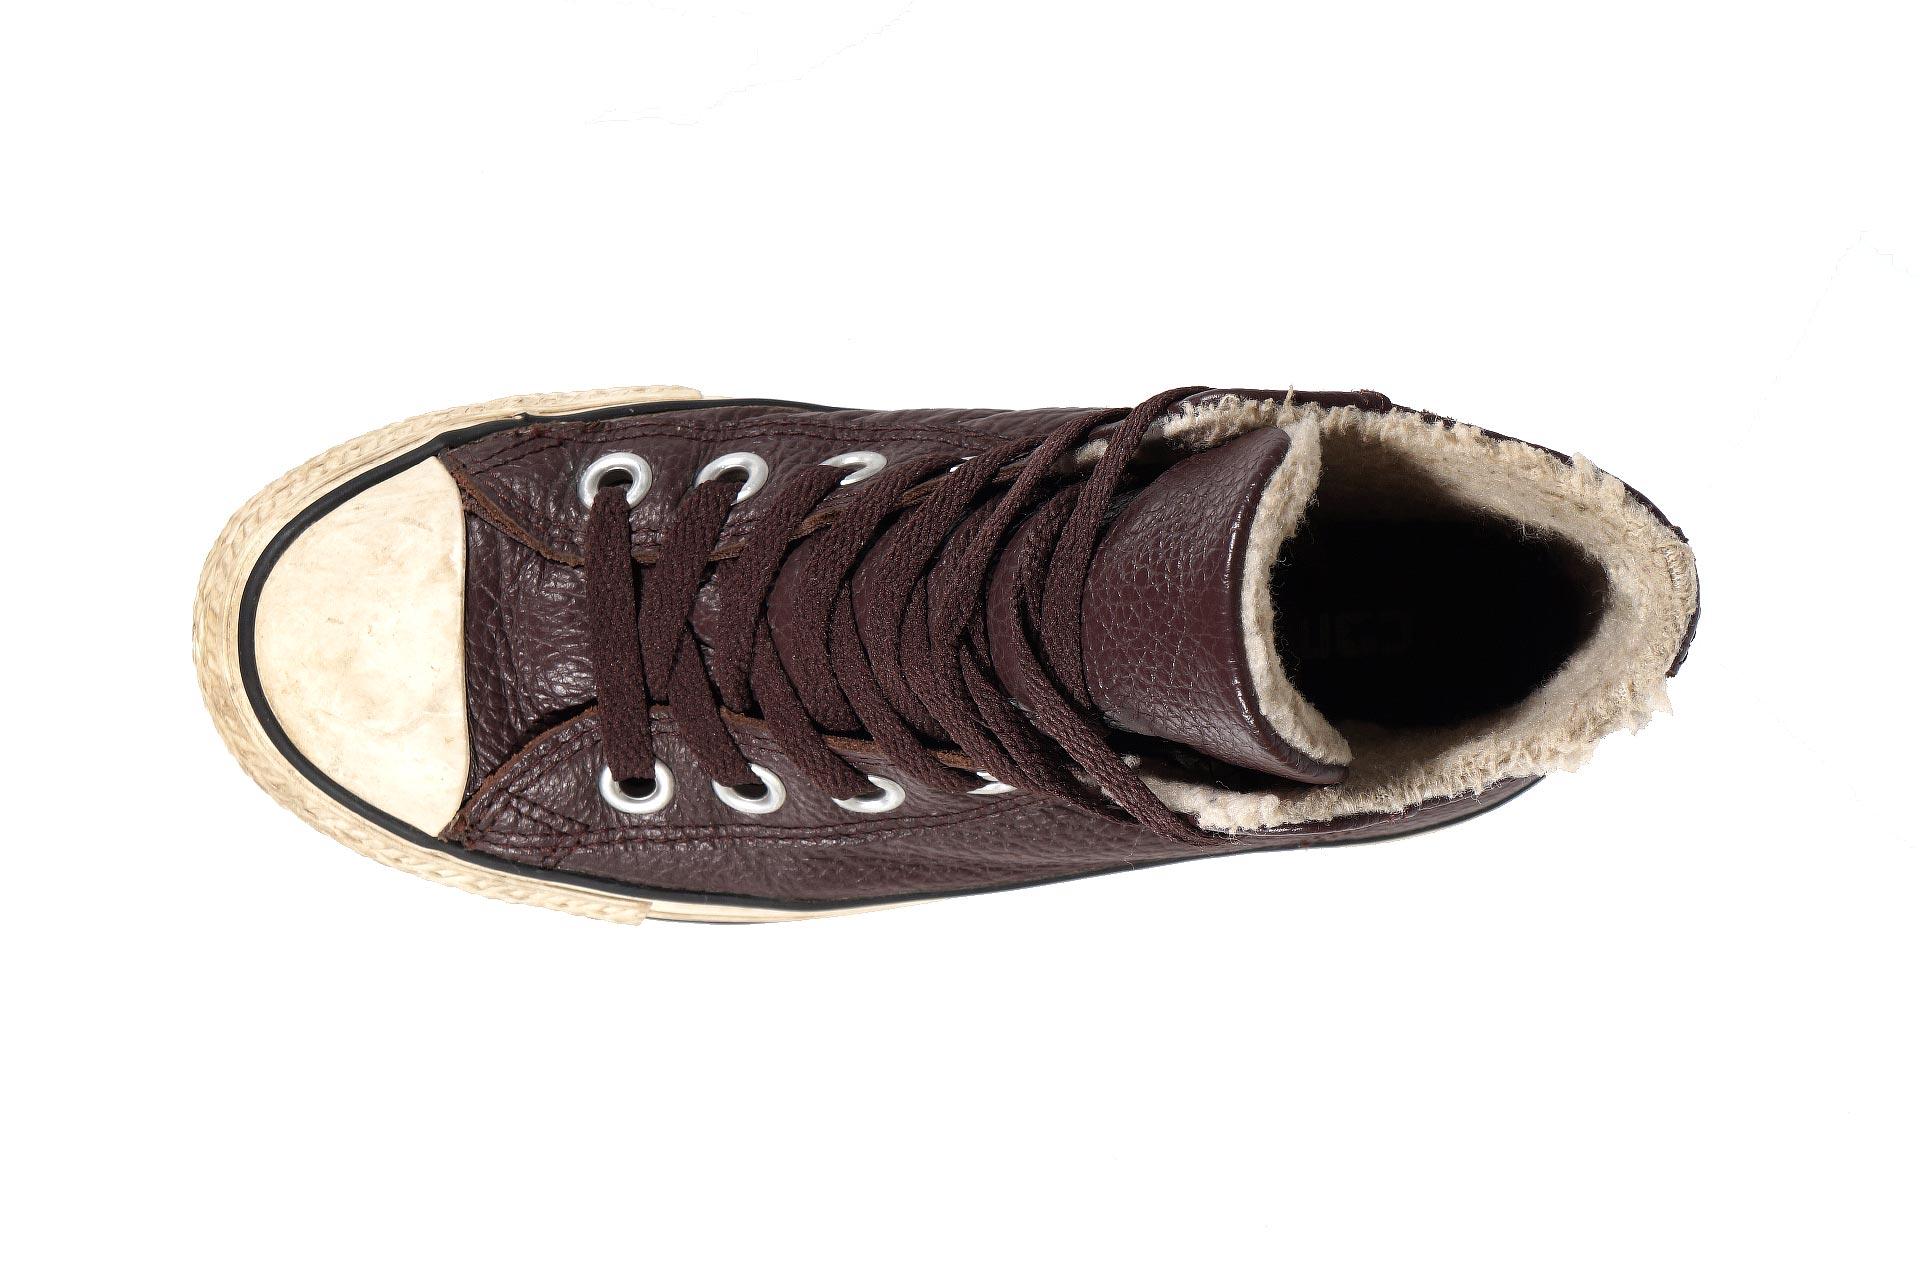 Converse Chuck Taylor All Star Winter Boot 144730 (00145 U)